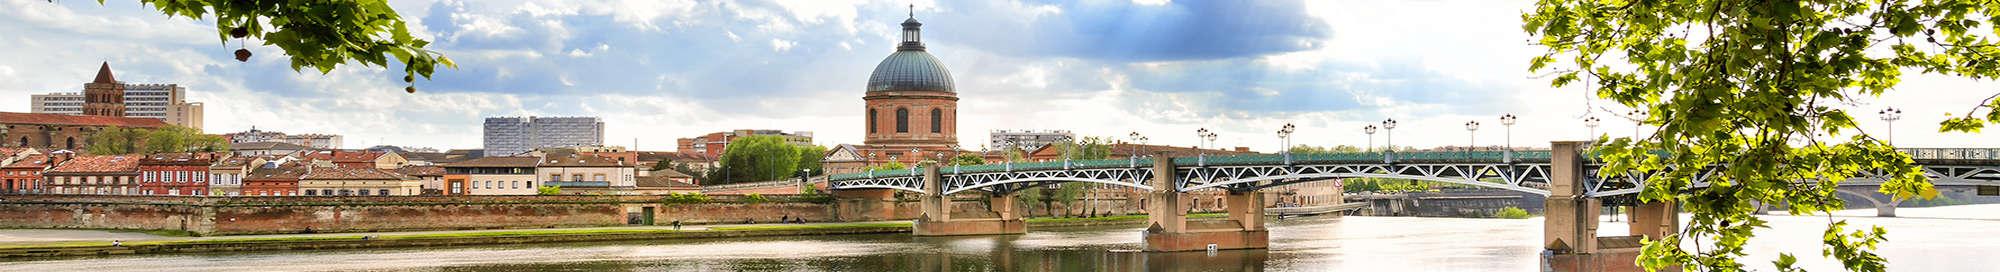 Week-end spécial Black Week à Toulouse